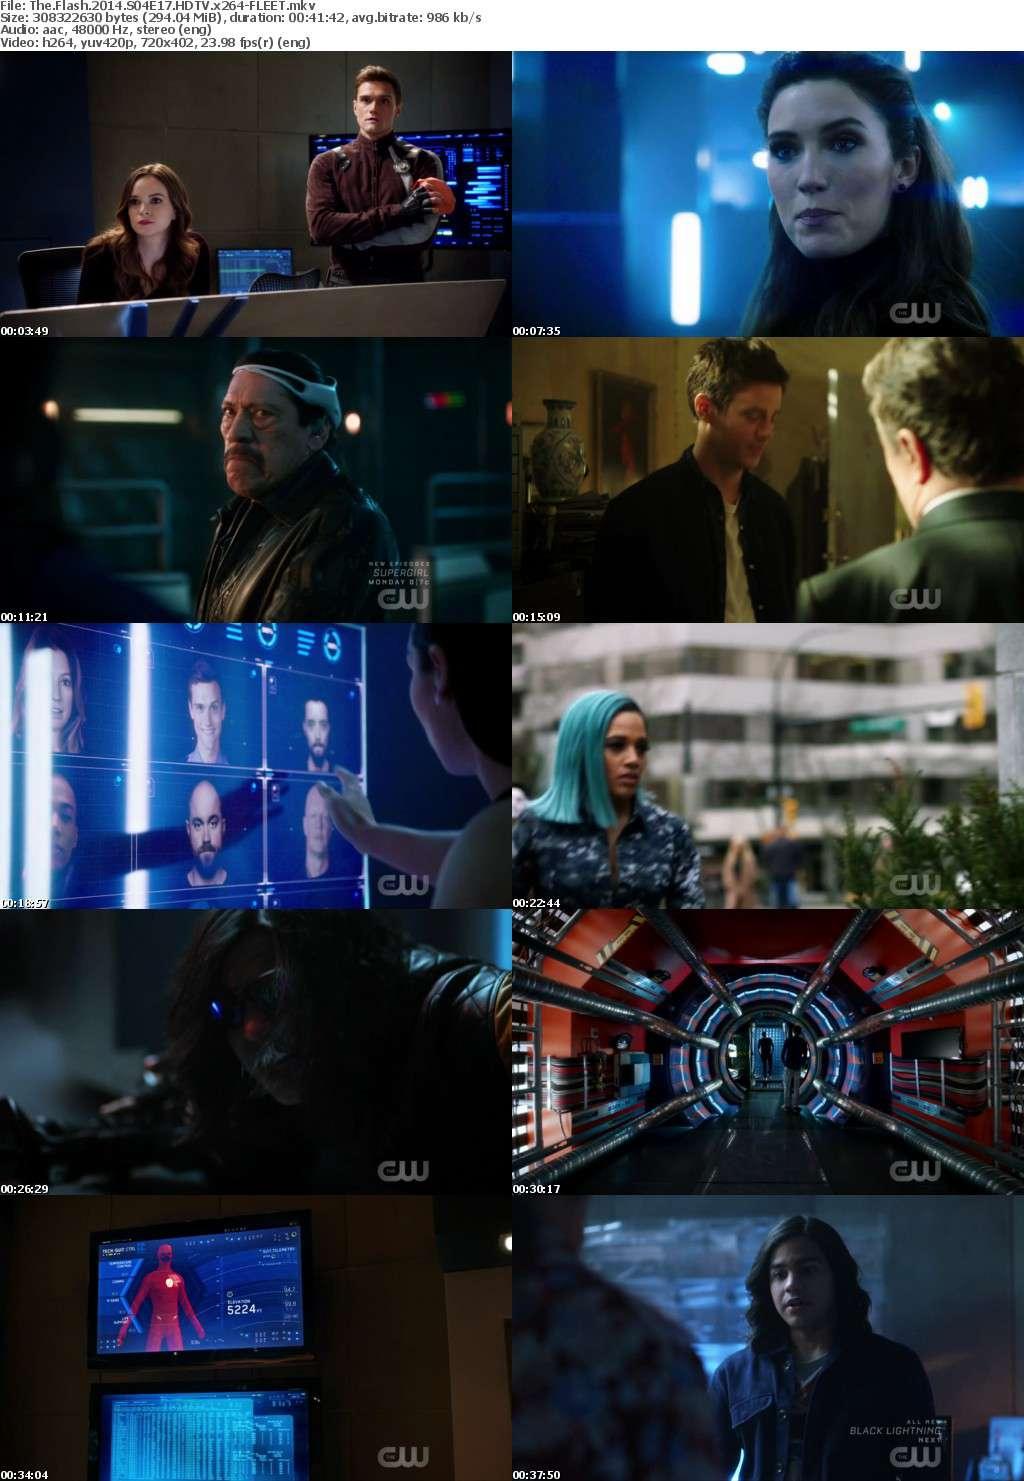 The Flash 2014 S04E17 HDTV x264-FLEET